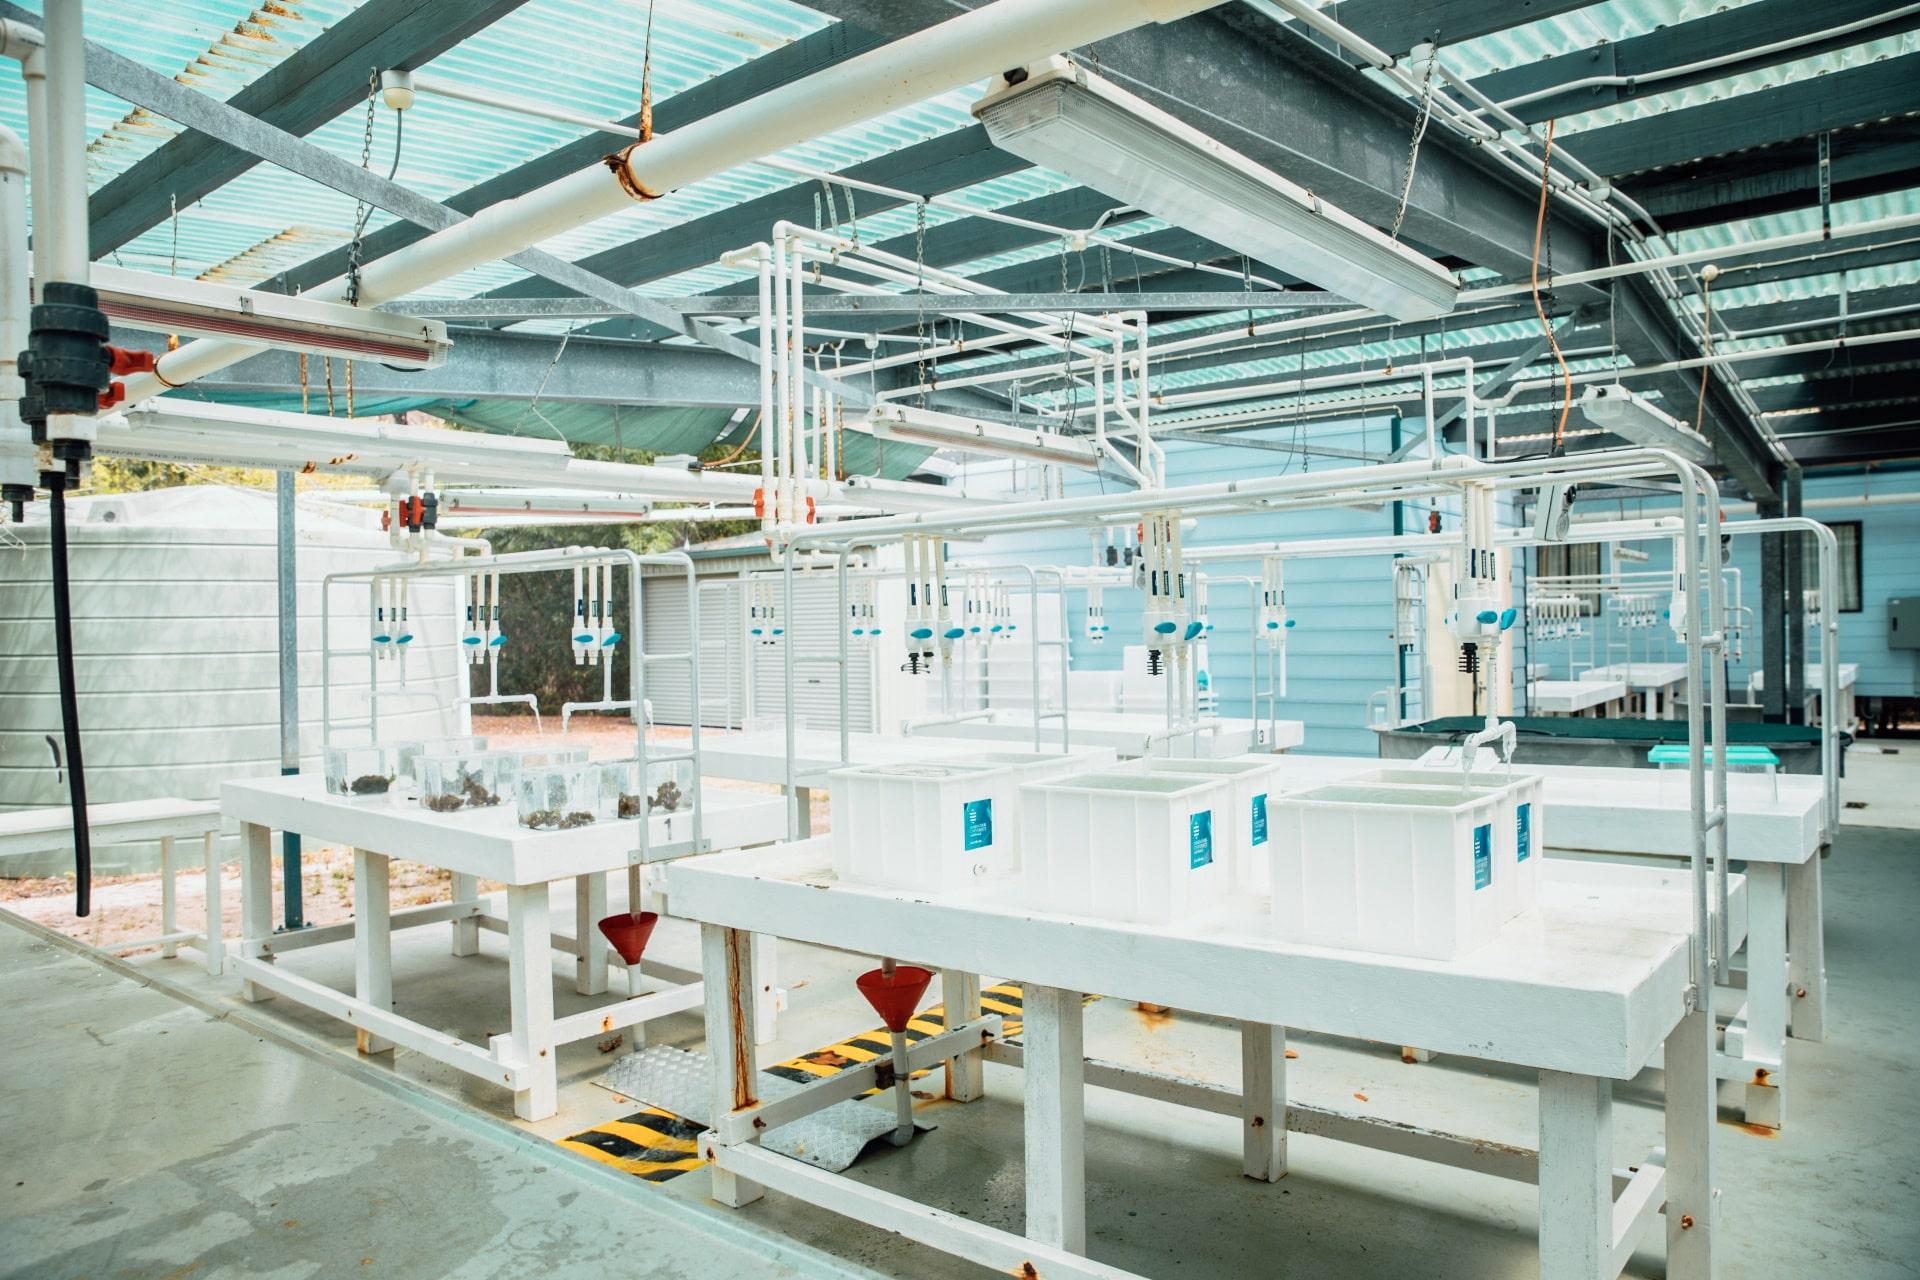 wetlab tables